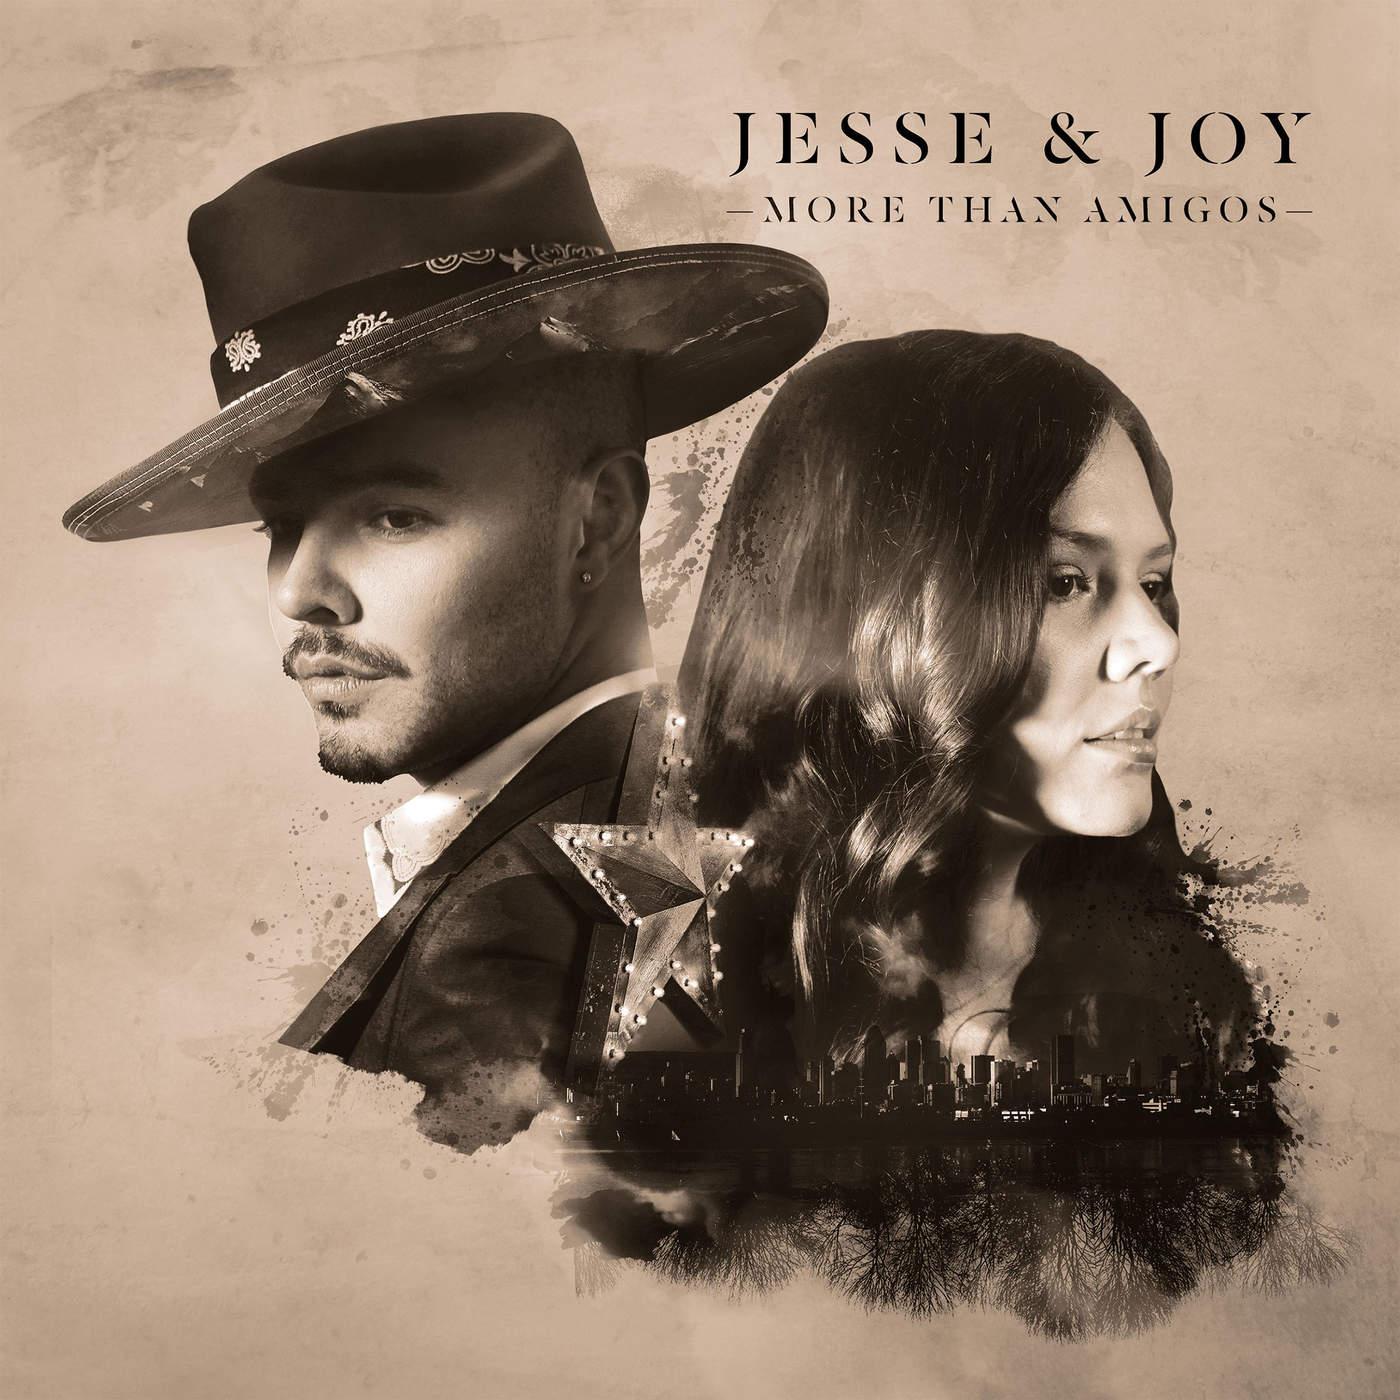 Jesse & Joy - More Than Amigos (Radio Edit) - Single Cover